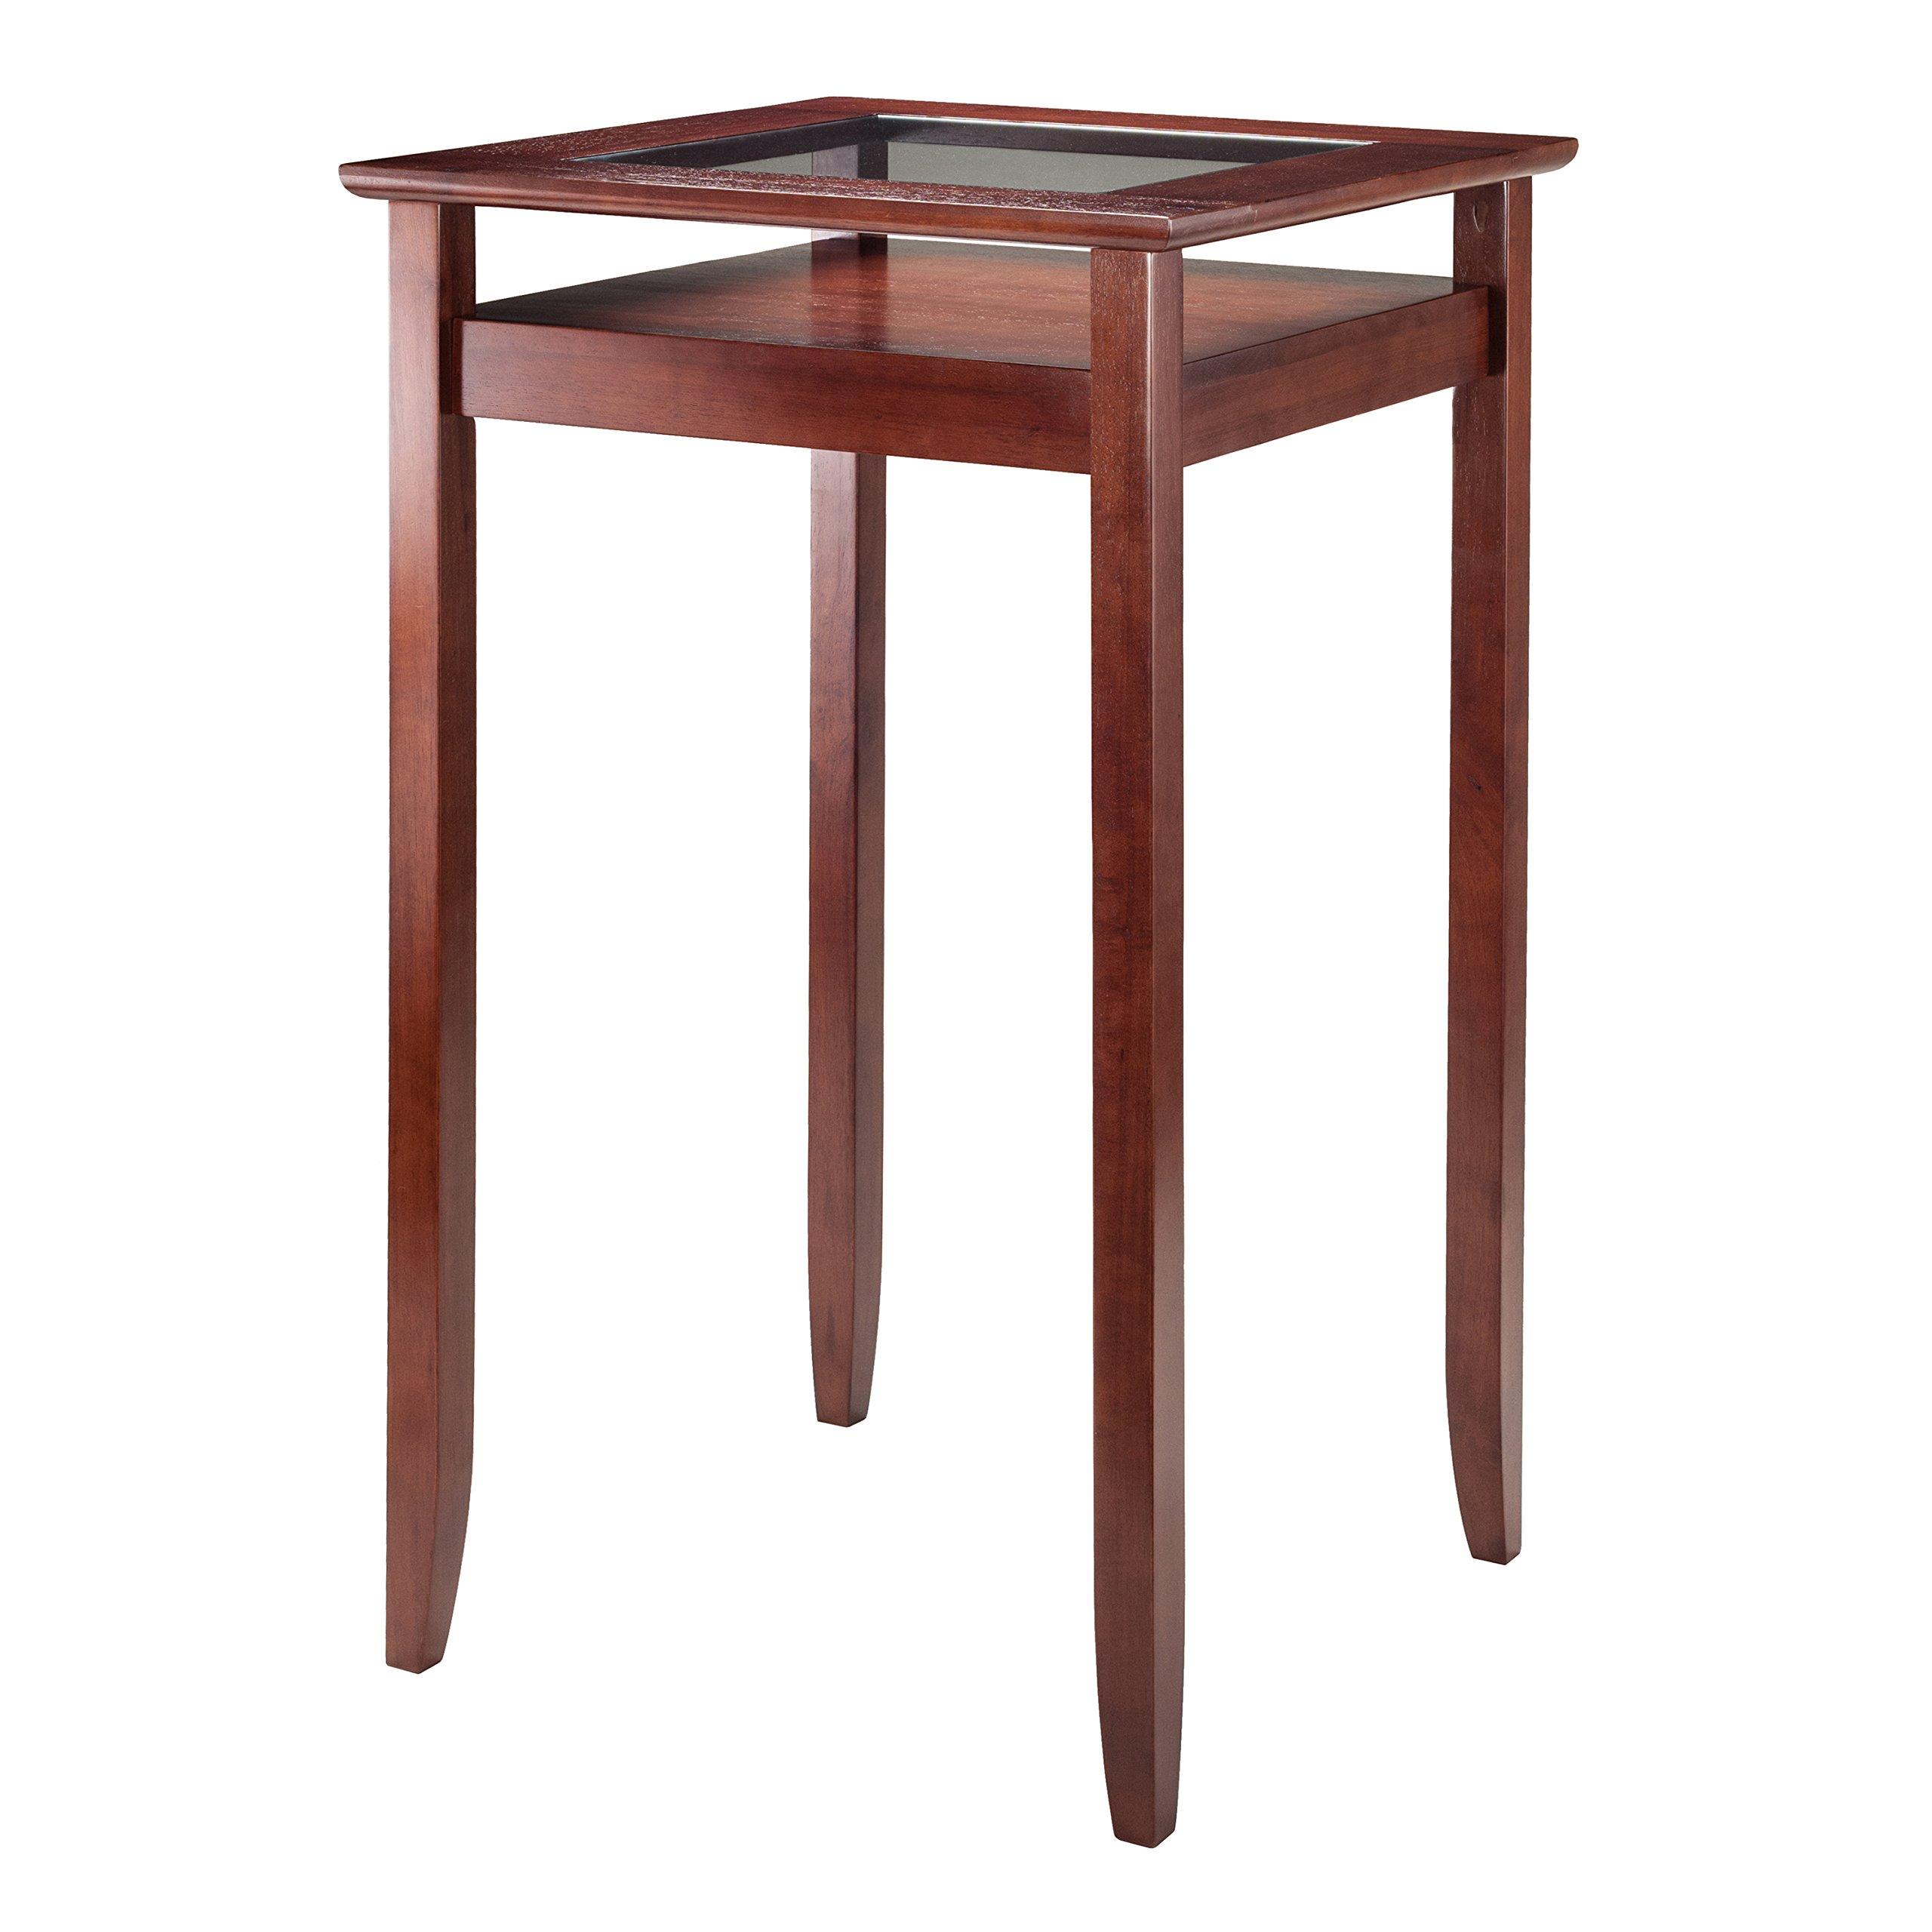 Winsome Wood Halo Pub Table with Glass Inset & Shelf, Walnut